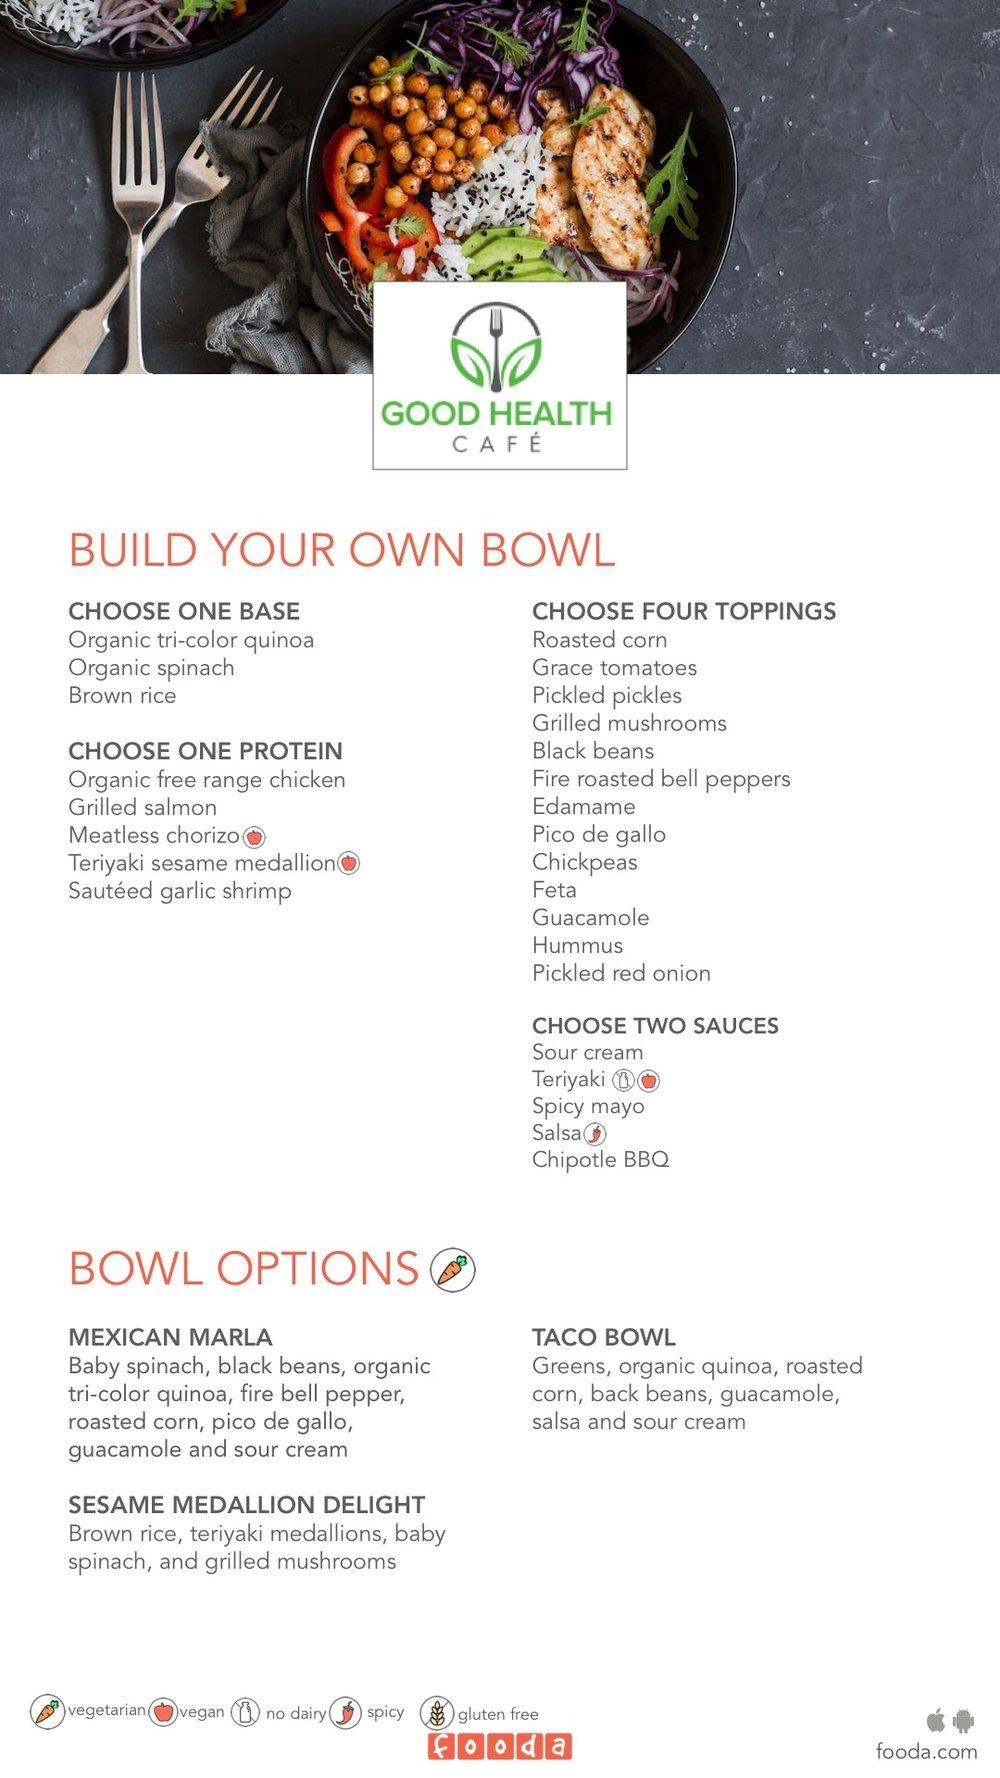 PPP Good Health - Bowls 4.13.18 (1).jpg